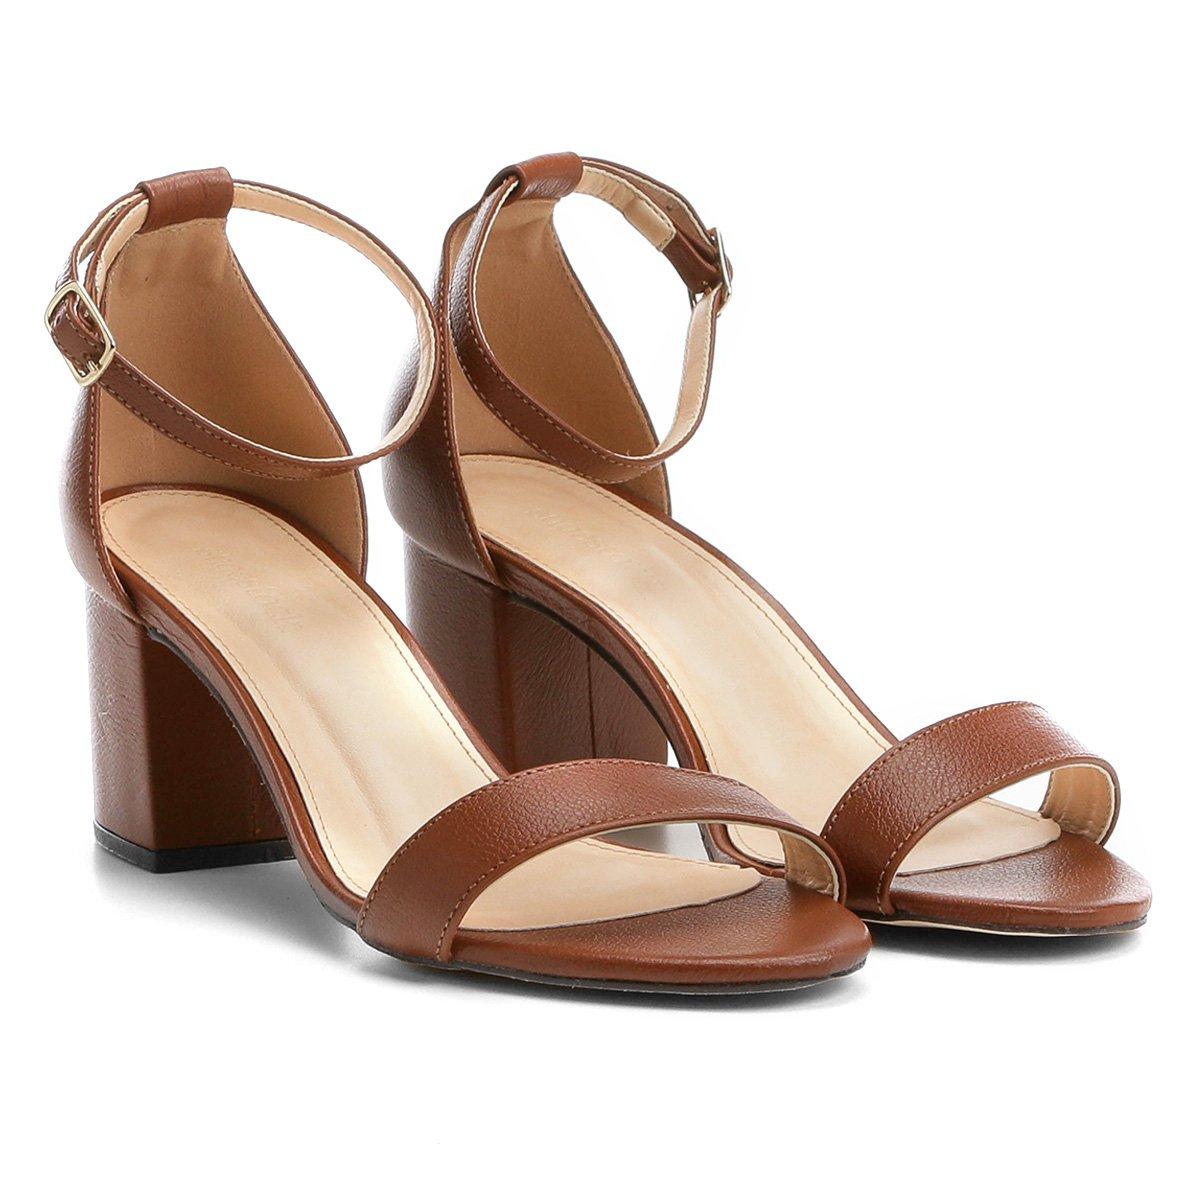 45ba634374 Sandália Couro Shoestock Salto Grosso Naked Feminina